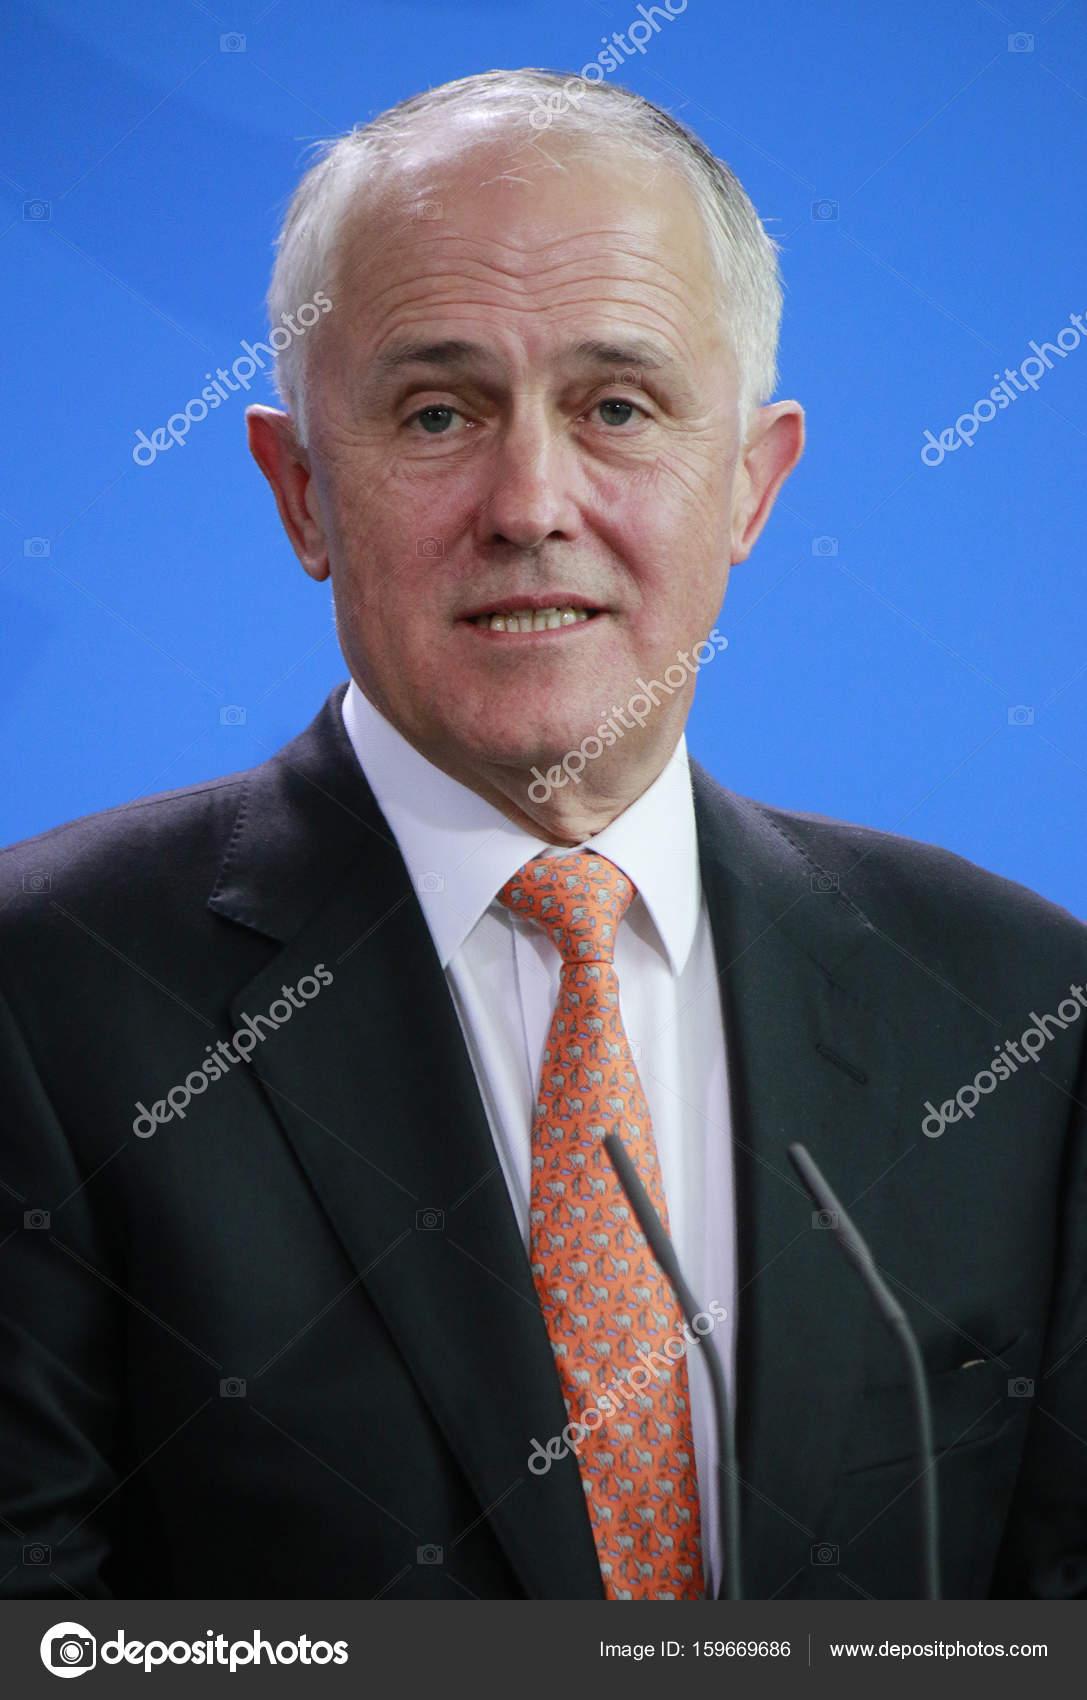 Avustralya Başbakanı Malcolm Turnbull - biyografi